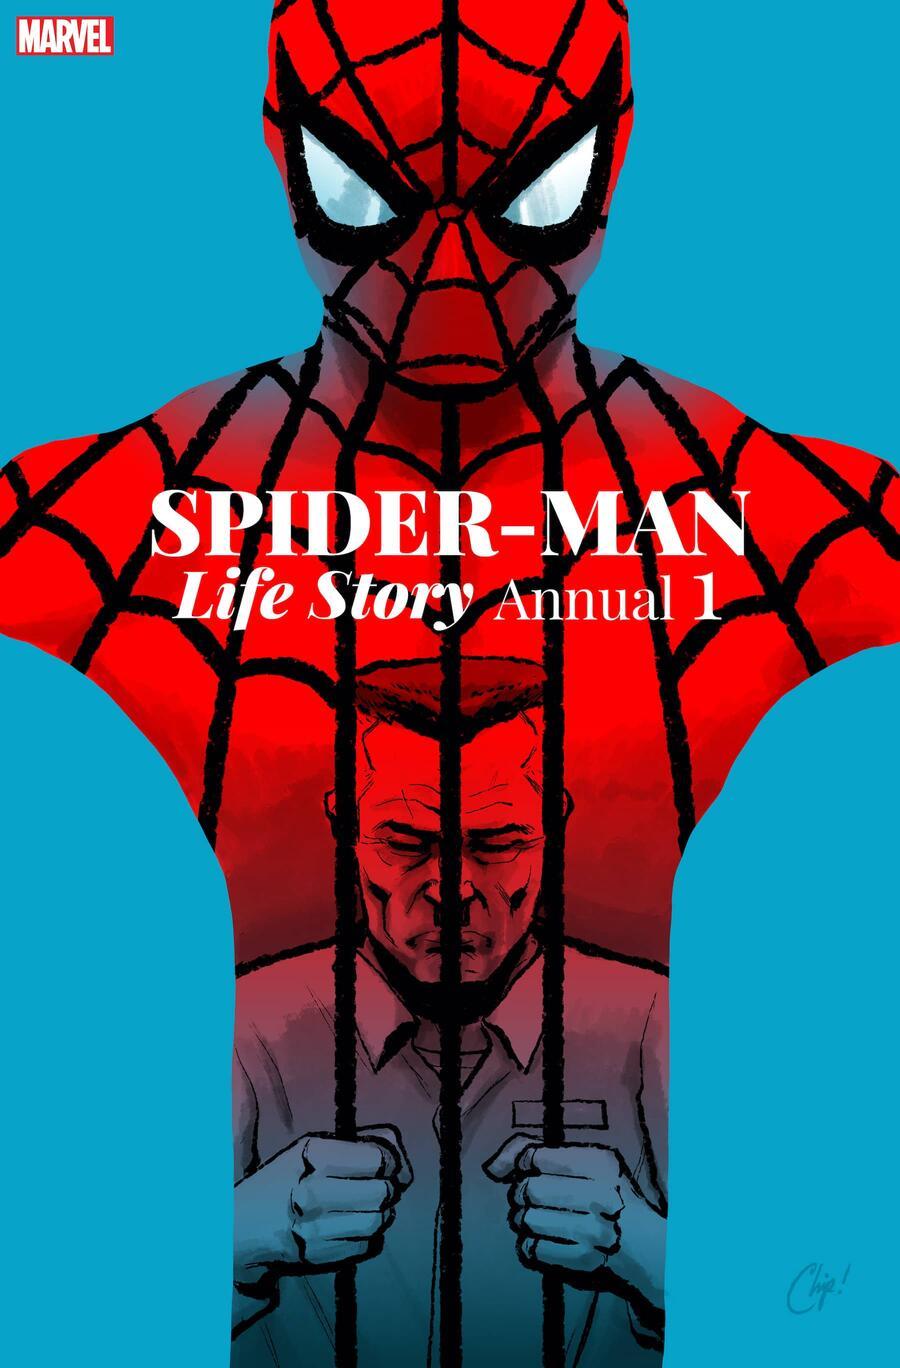 Spider-Man: Life Story Annual #1, copertina di Chip Zdarsky